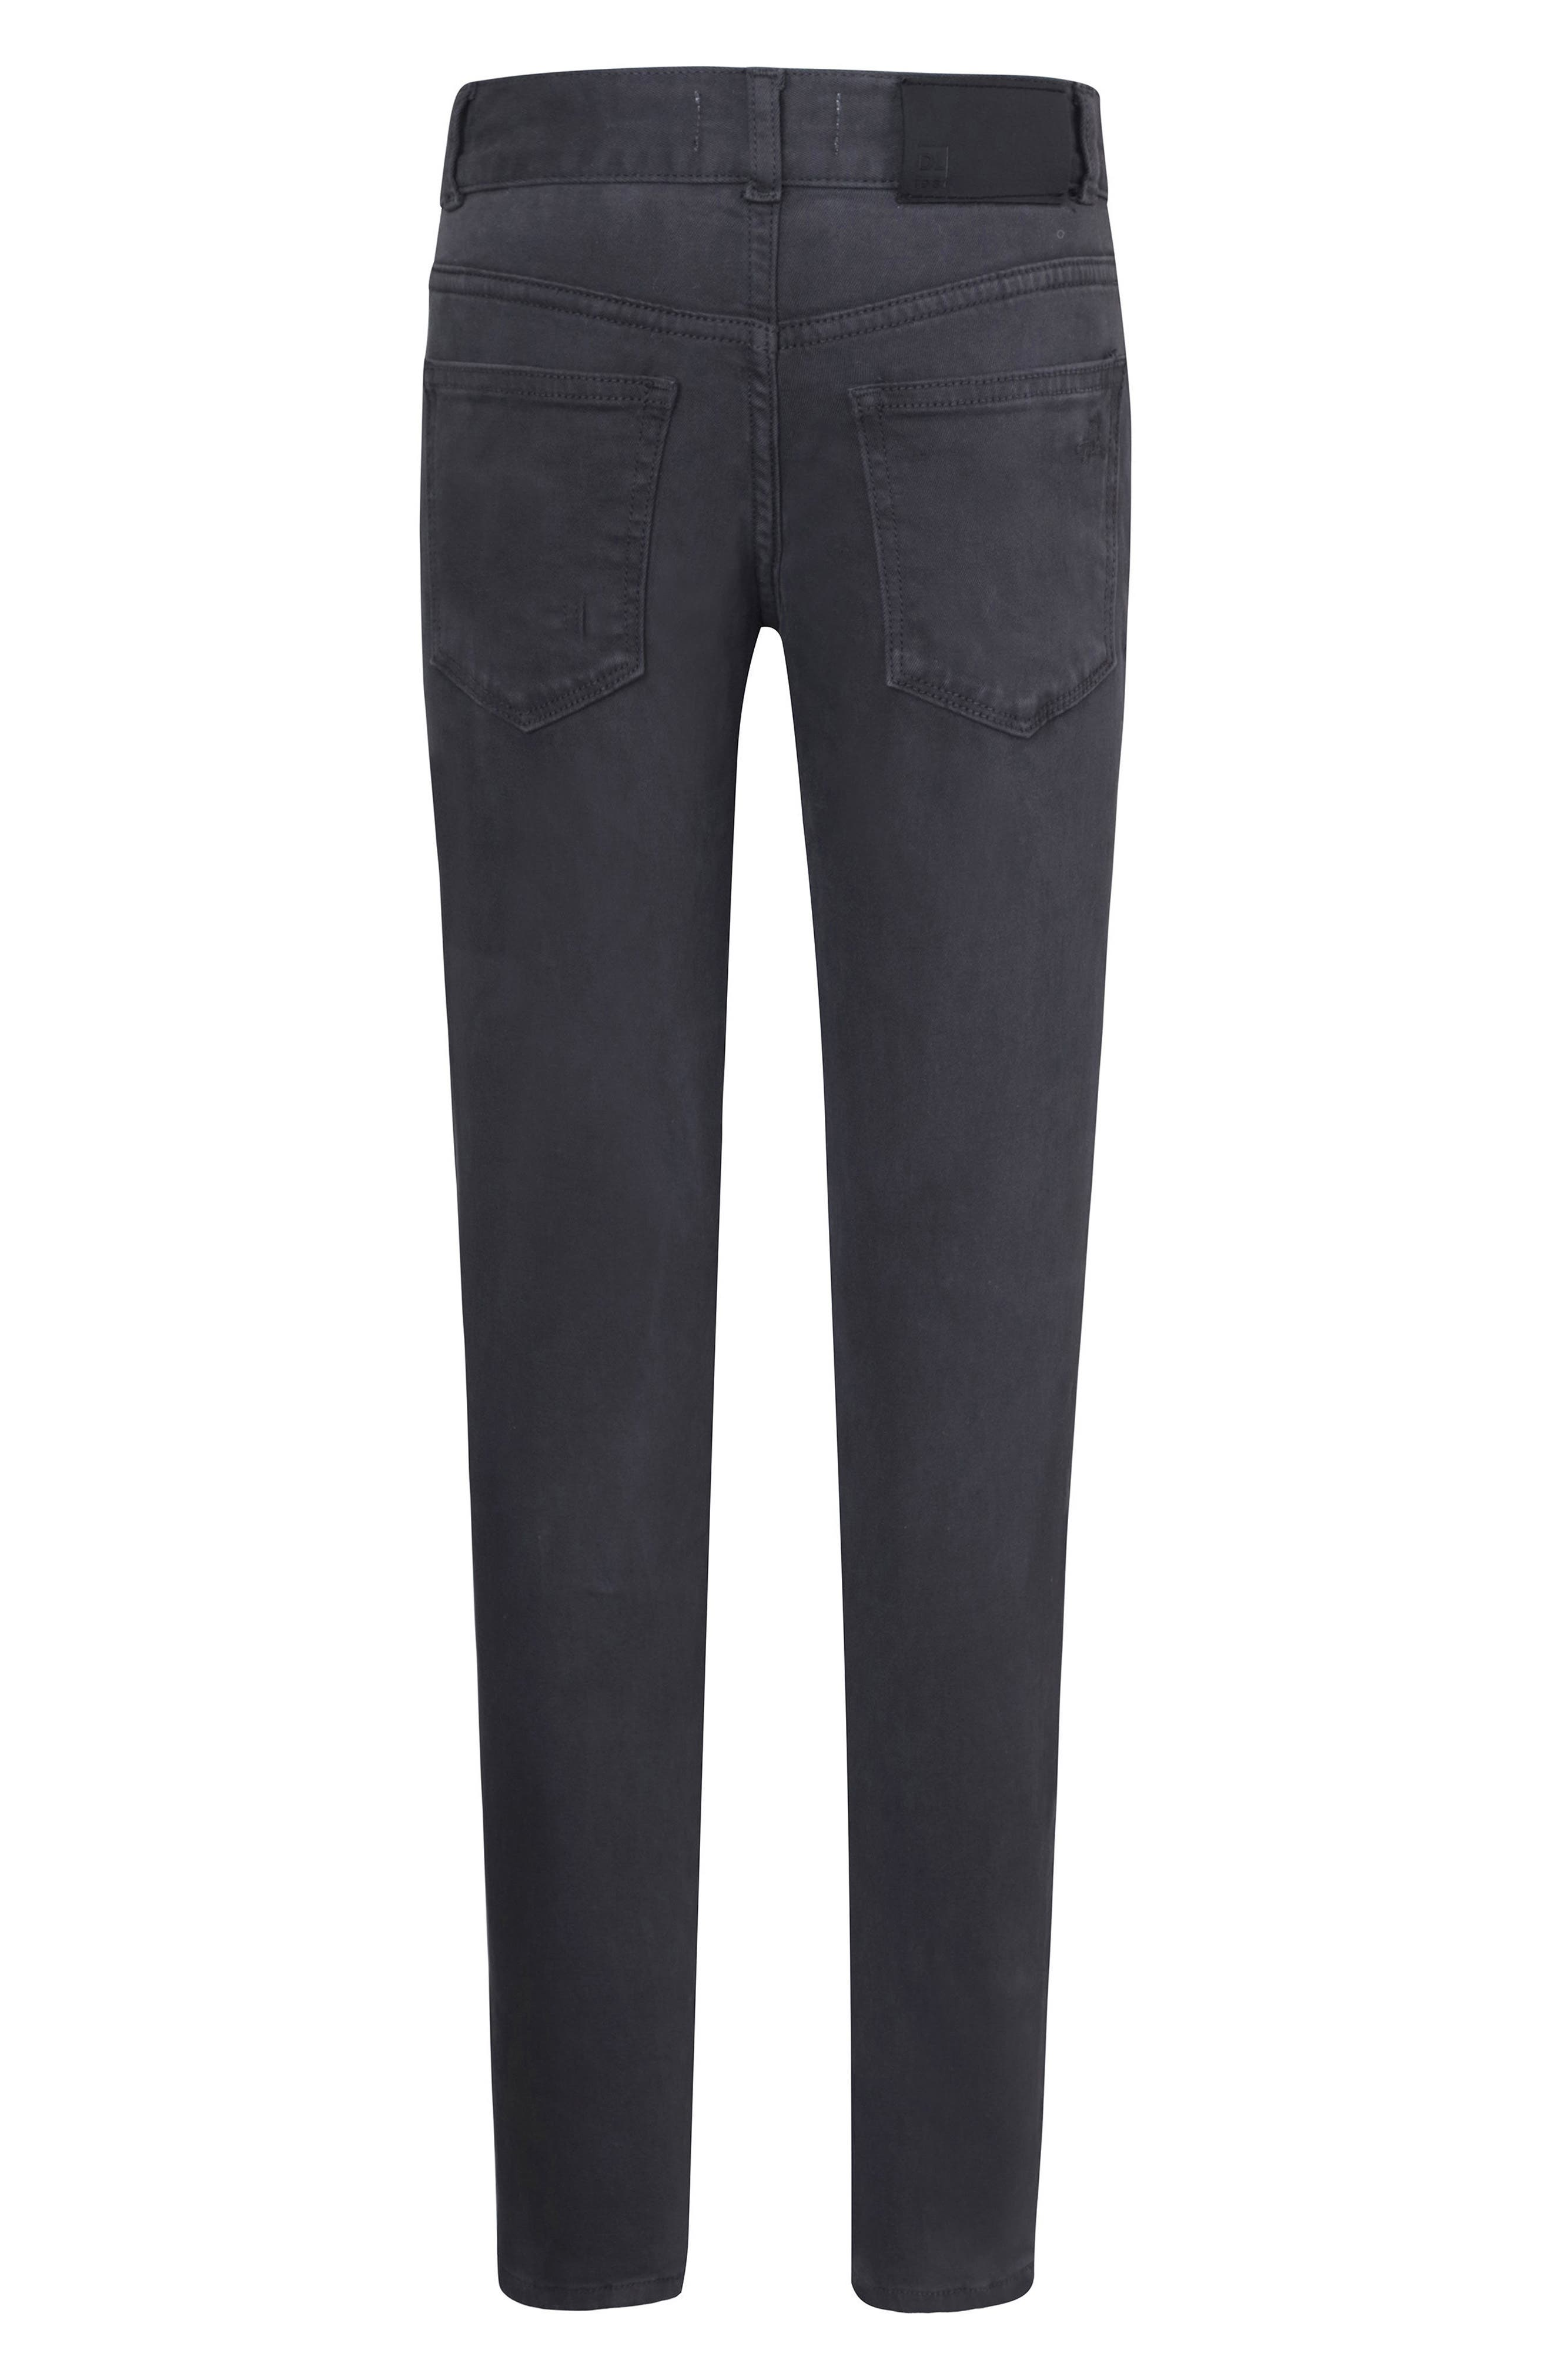 DL 1961 Hawke Skinny Jeans,                             Alternate thumbnail 2, color,                             DAB